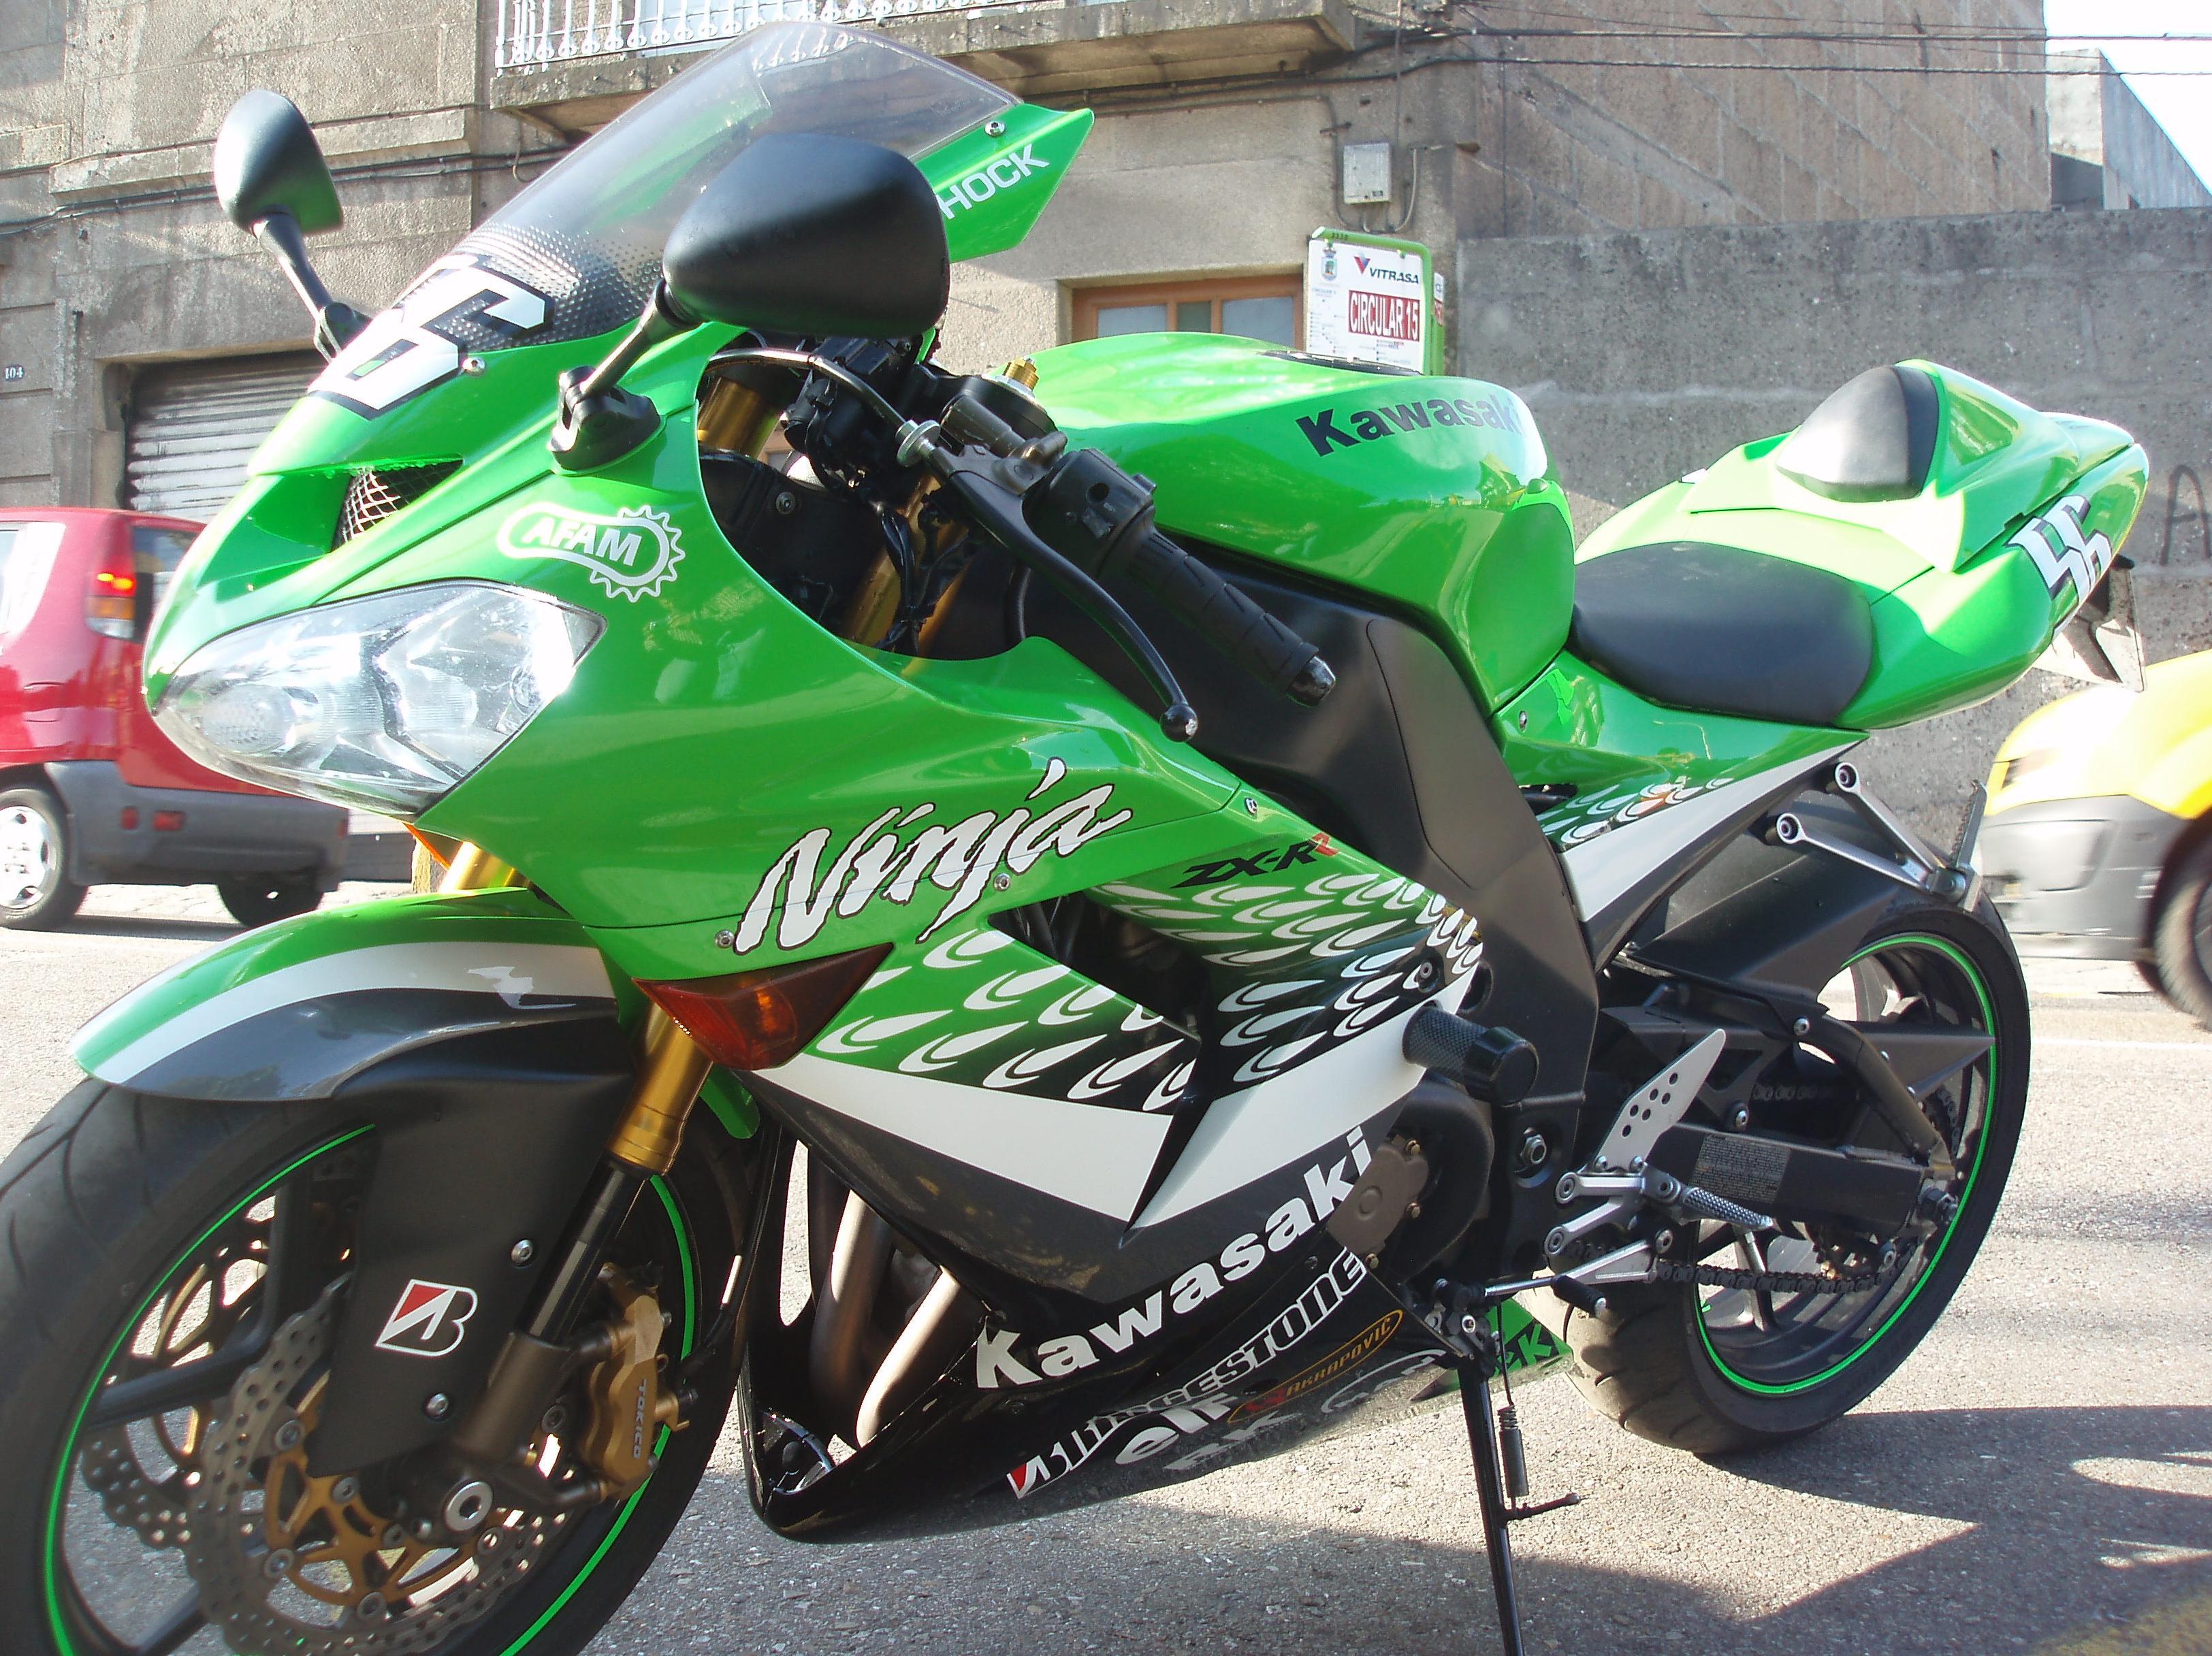 Foto 8 de Motos en Vigo | Moto 2